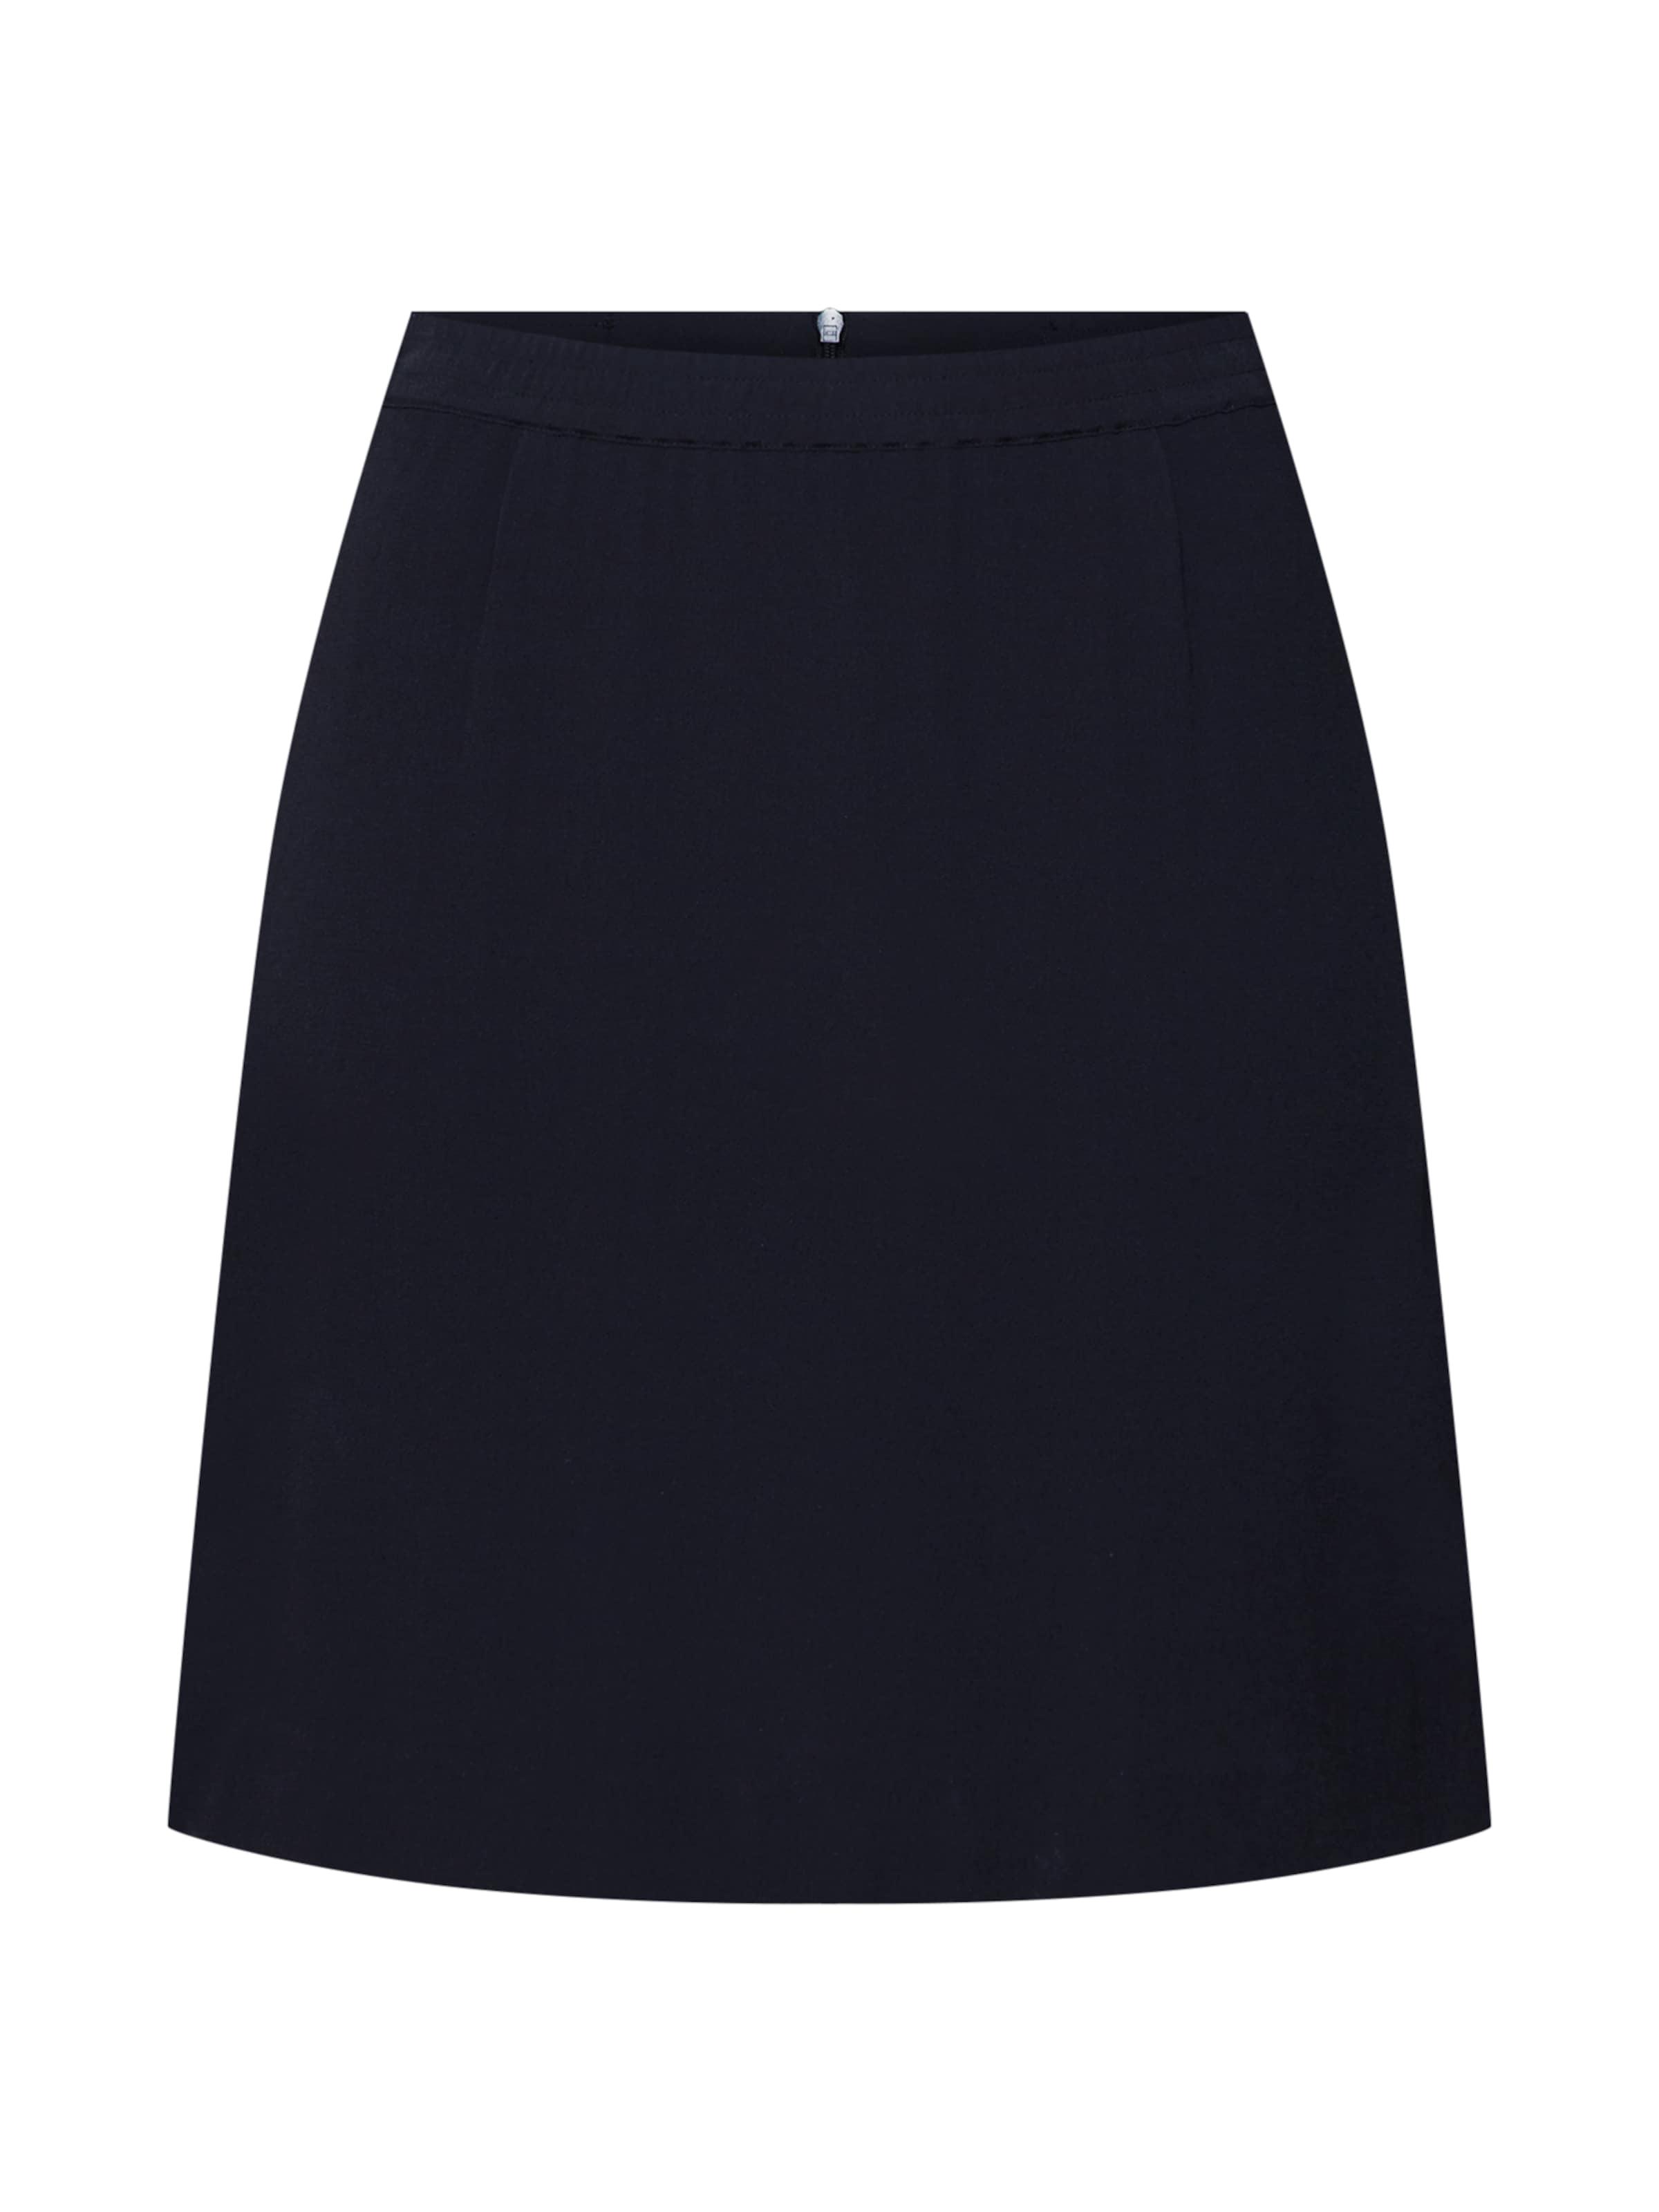 Copenhagen In Rock Skirt' Pop 'georgette Schwarz 8nvOmNyP0w